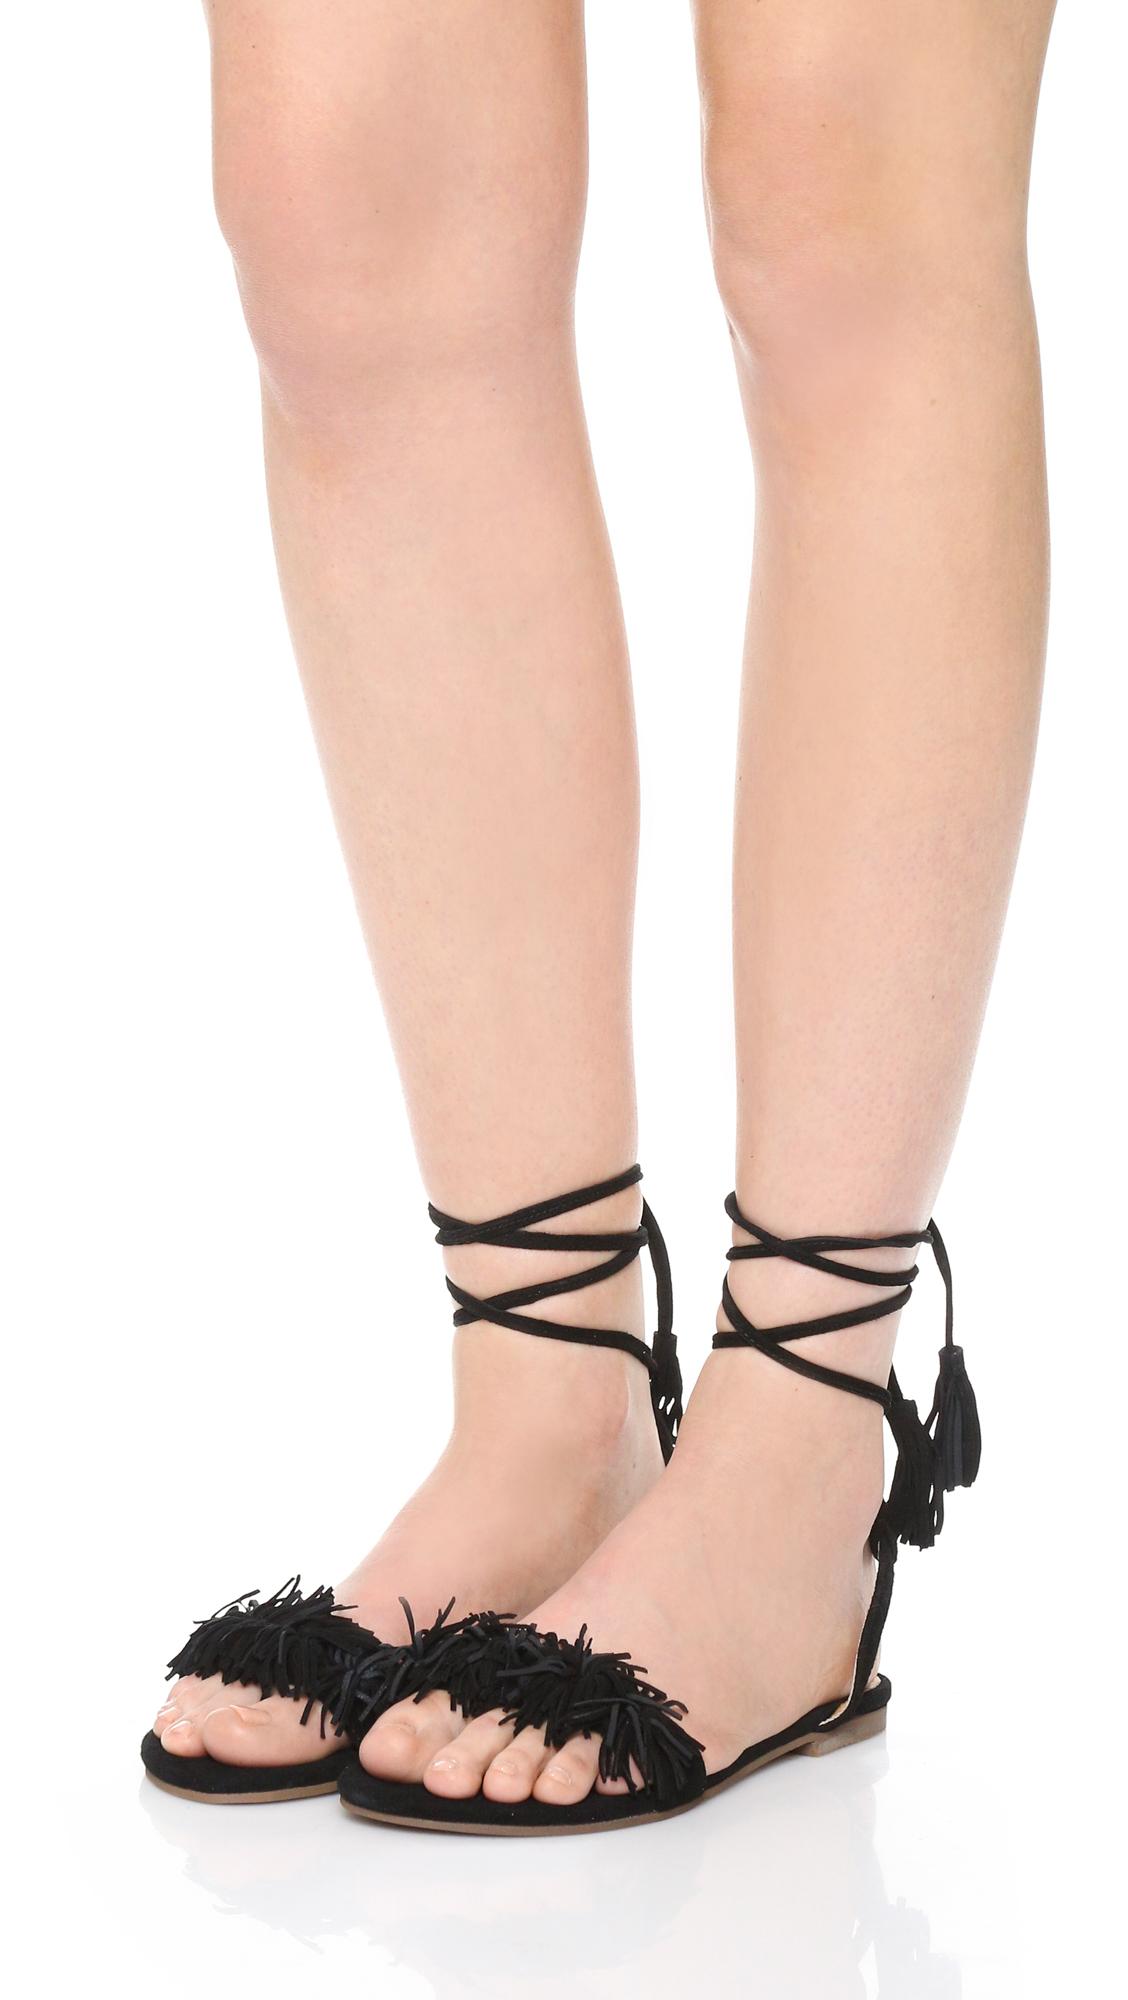 20f542c269f Matiko Delilah Fringe Flat Sandals in Black - Lyst